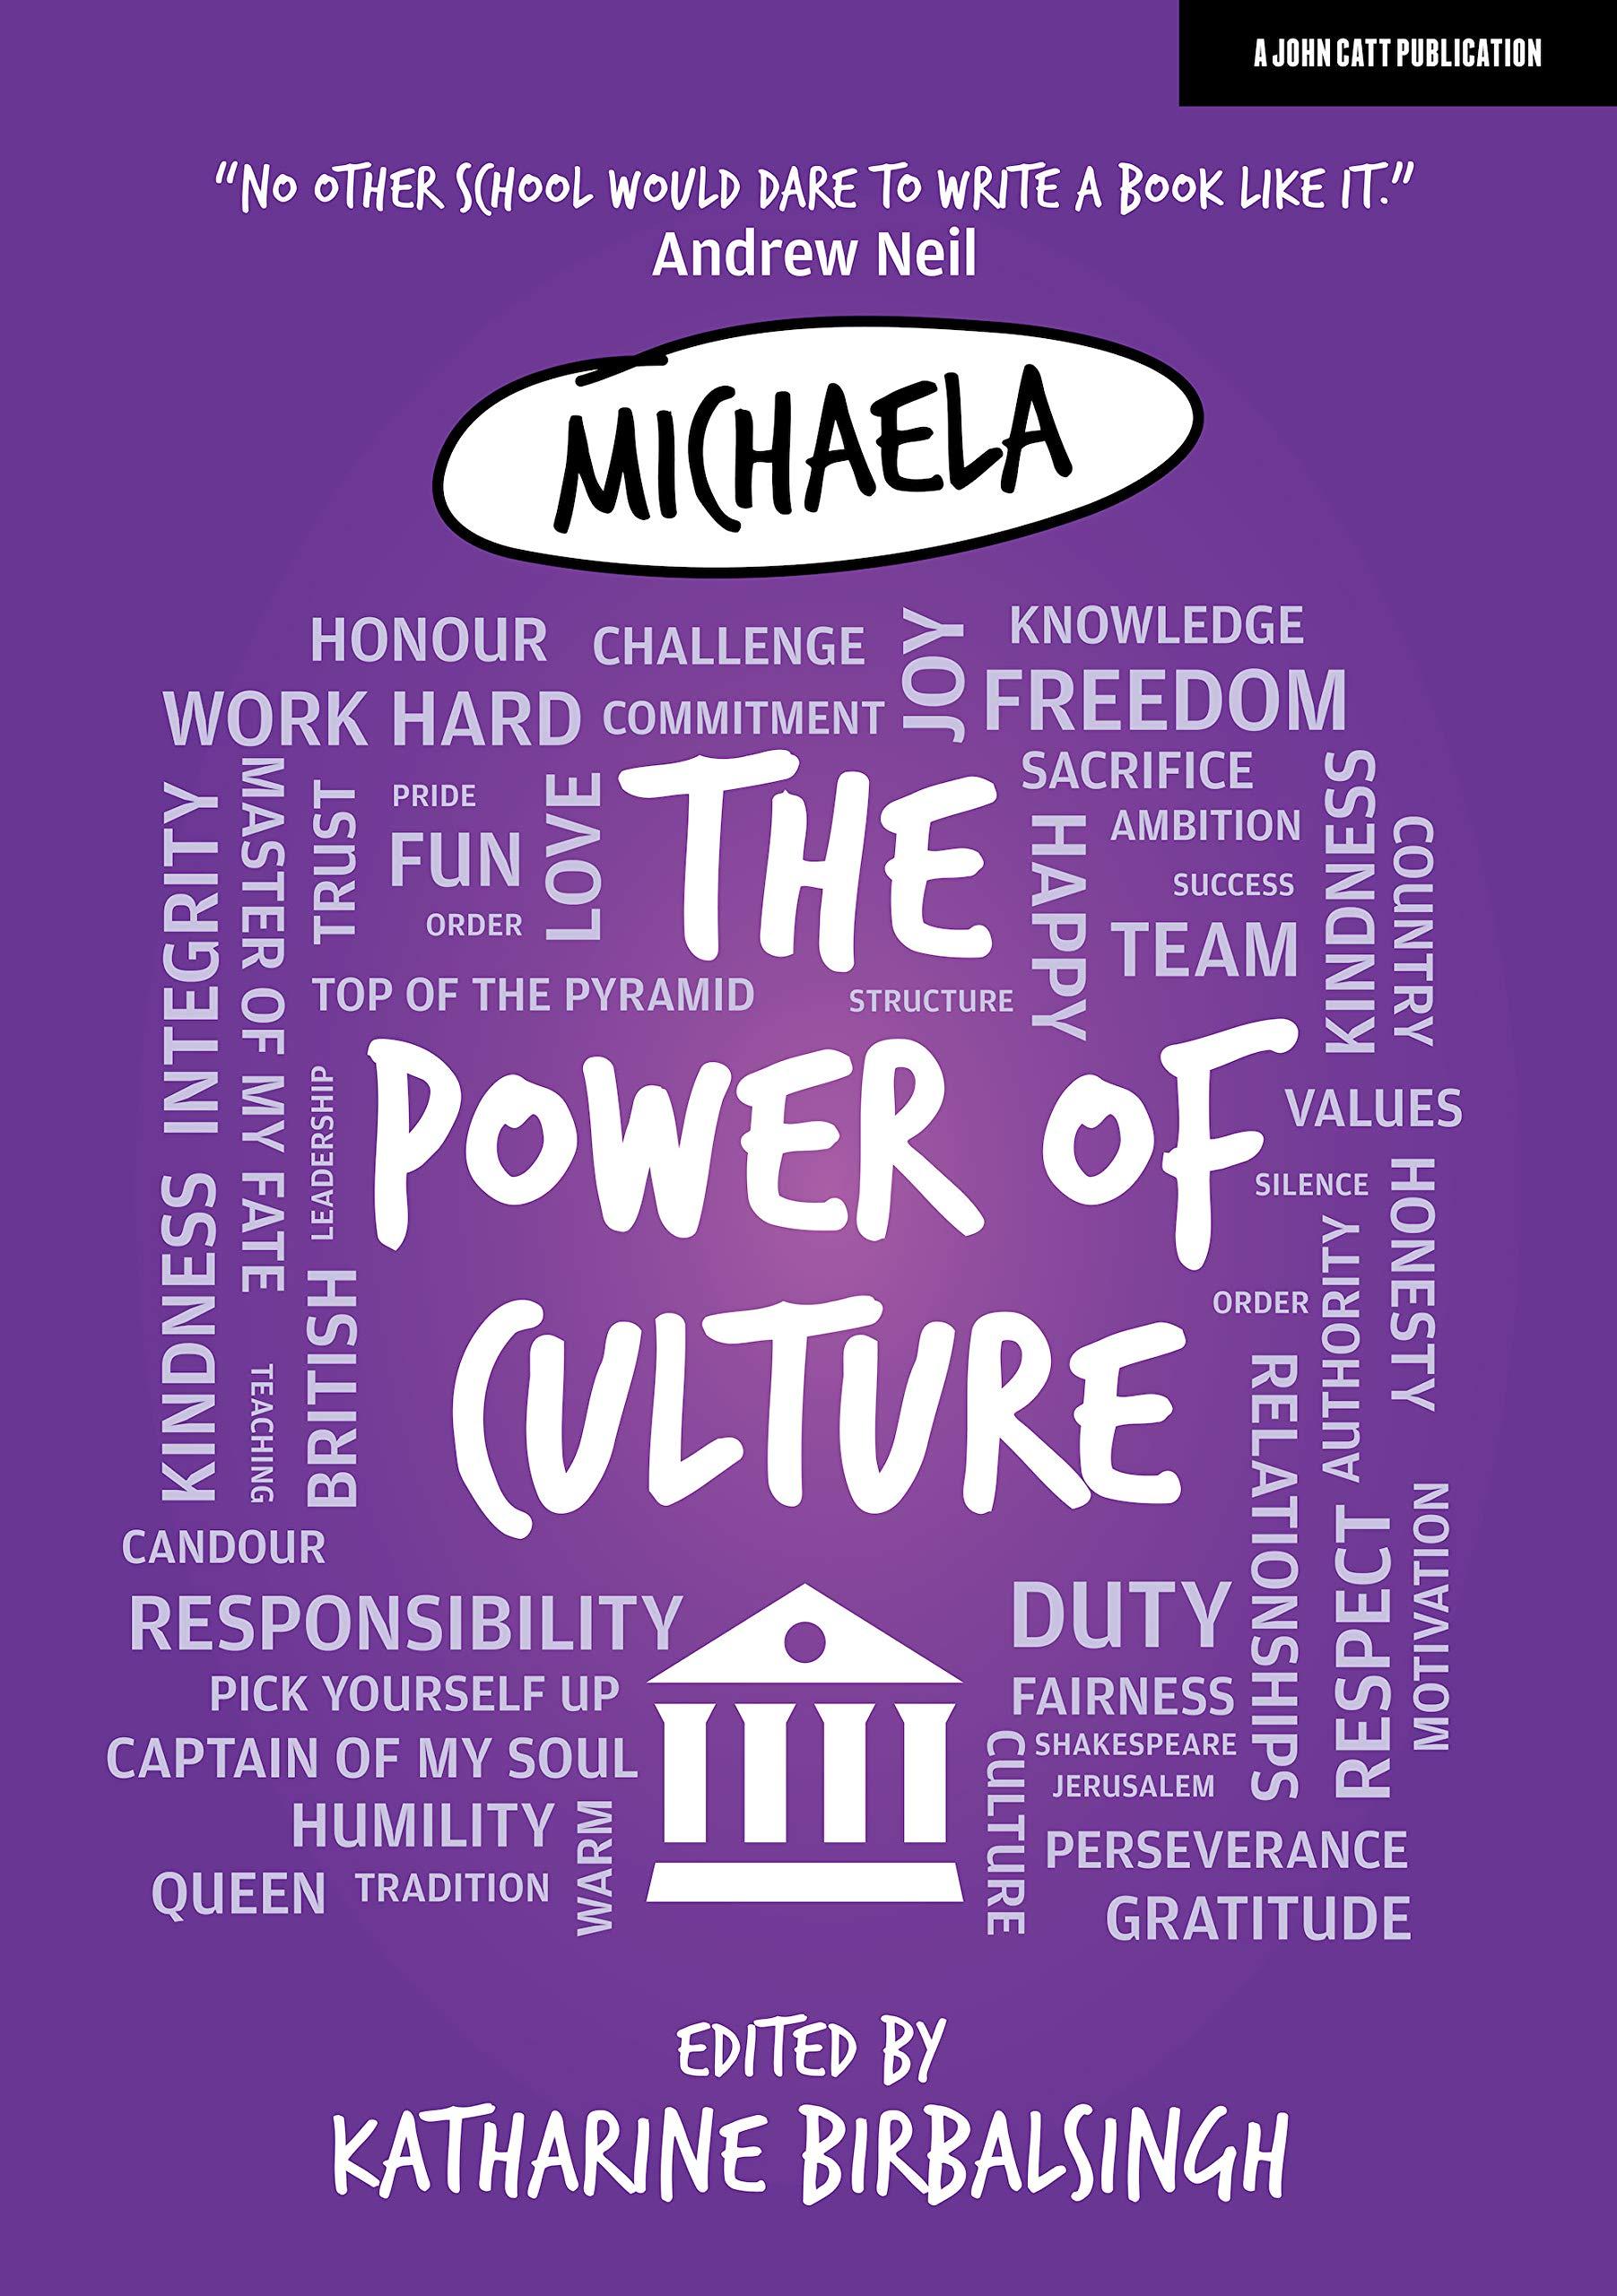 Michaela: The Power of Culture: Amazon.co.uk: Katharine Birbalsingh,  Various Michaela Community School staff: 9781912906215: Books